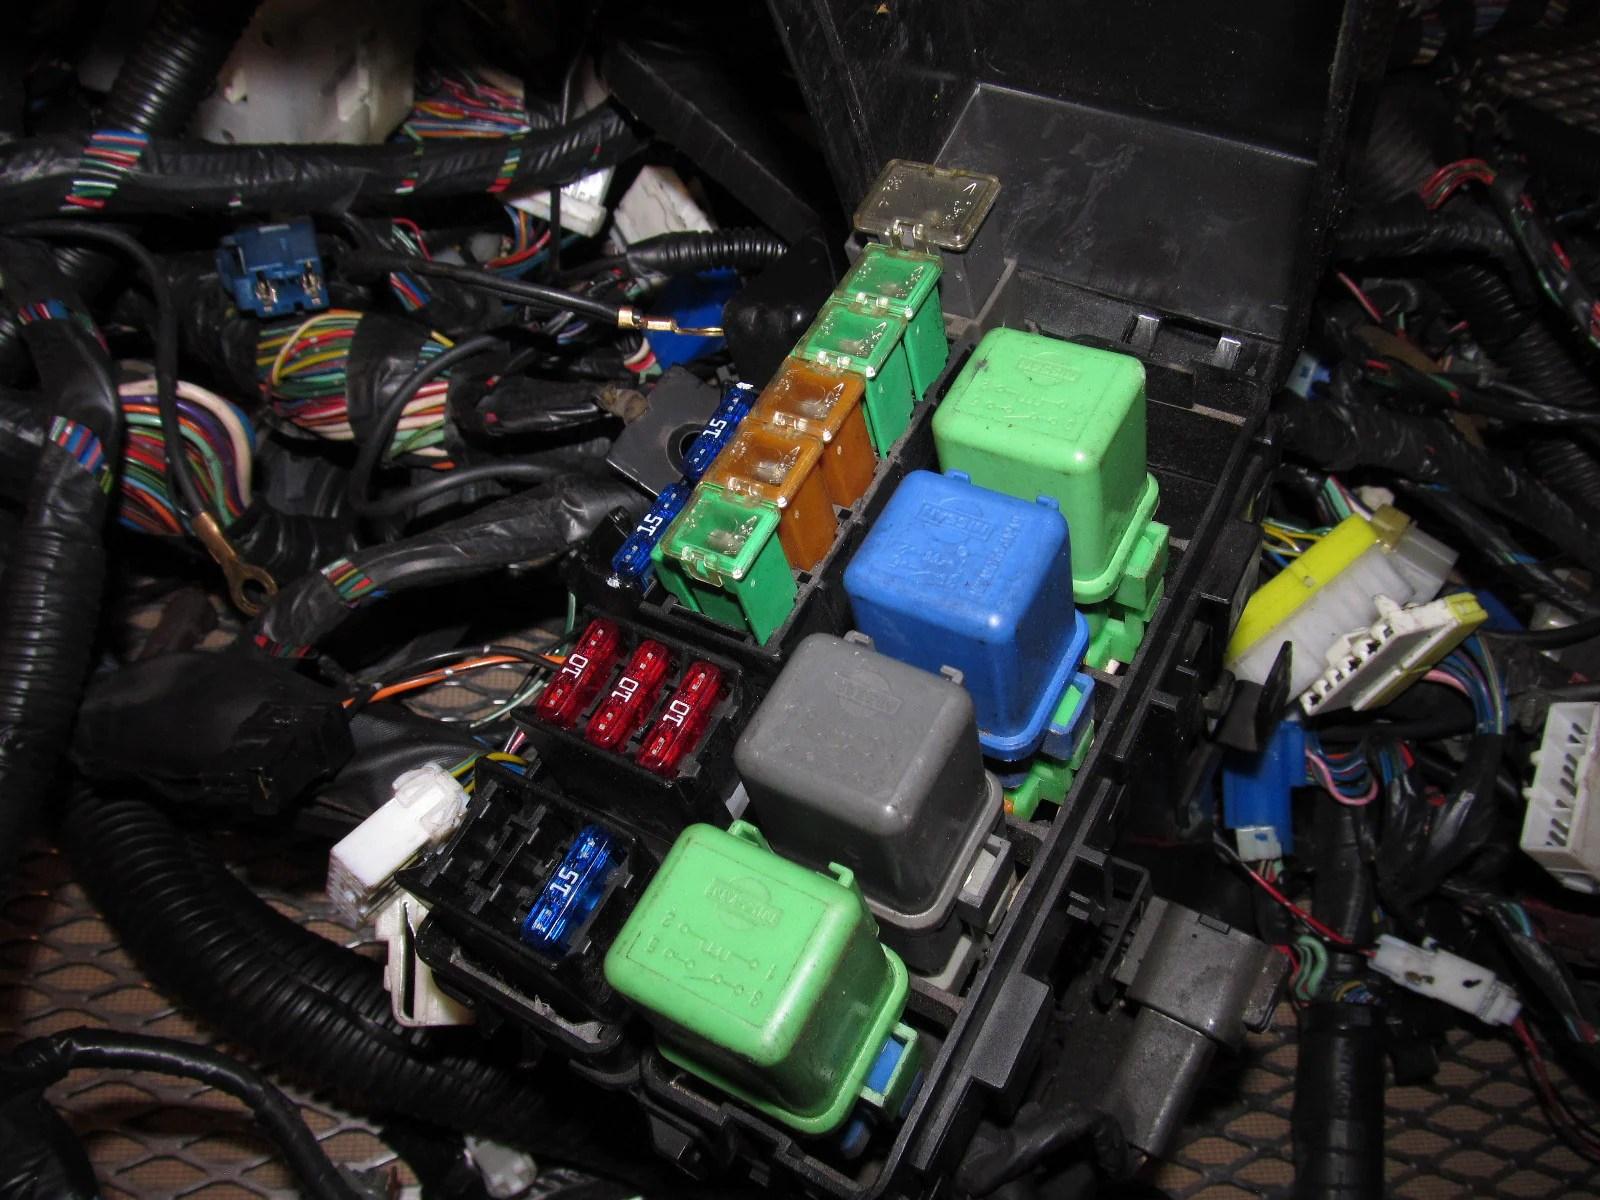 93 nissan 240sx fuse box diagram wiring diagram third level93 nissan 240sx fuse box diagram simple [ 1600 x 1200 Pixel ]